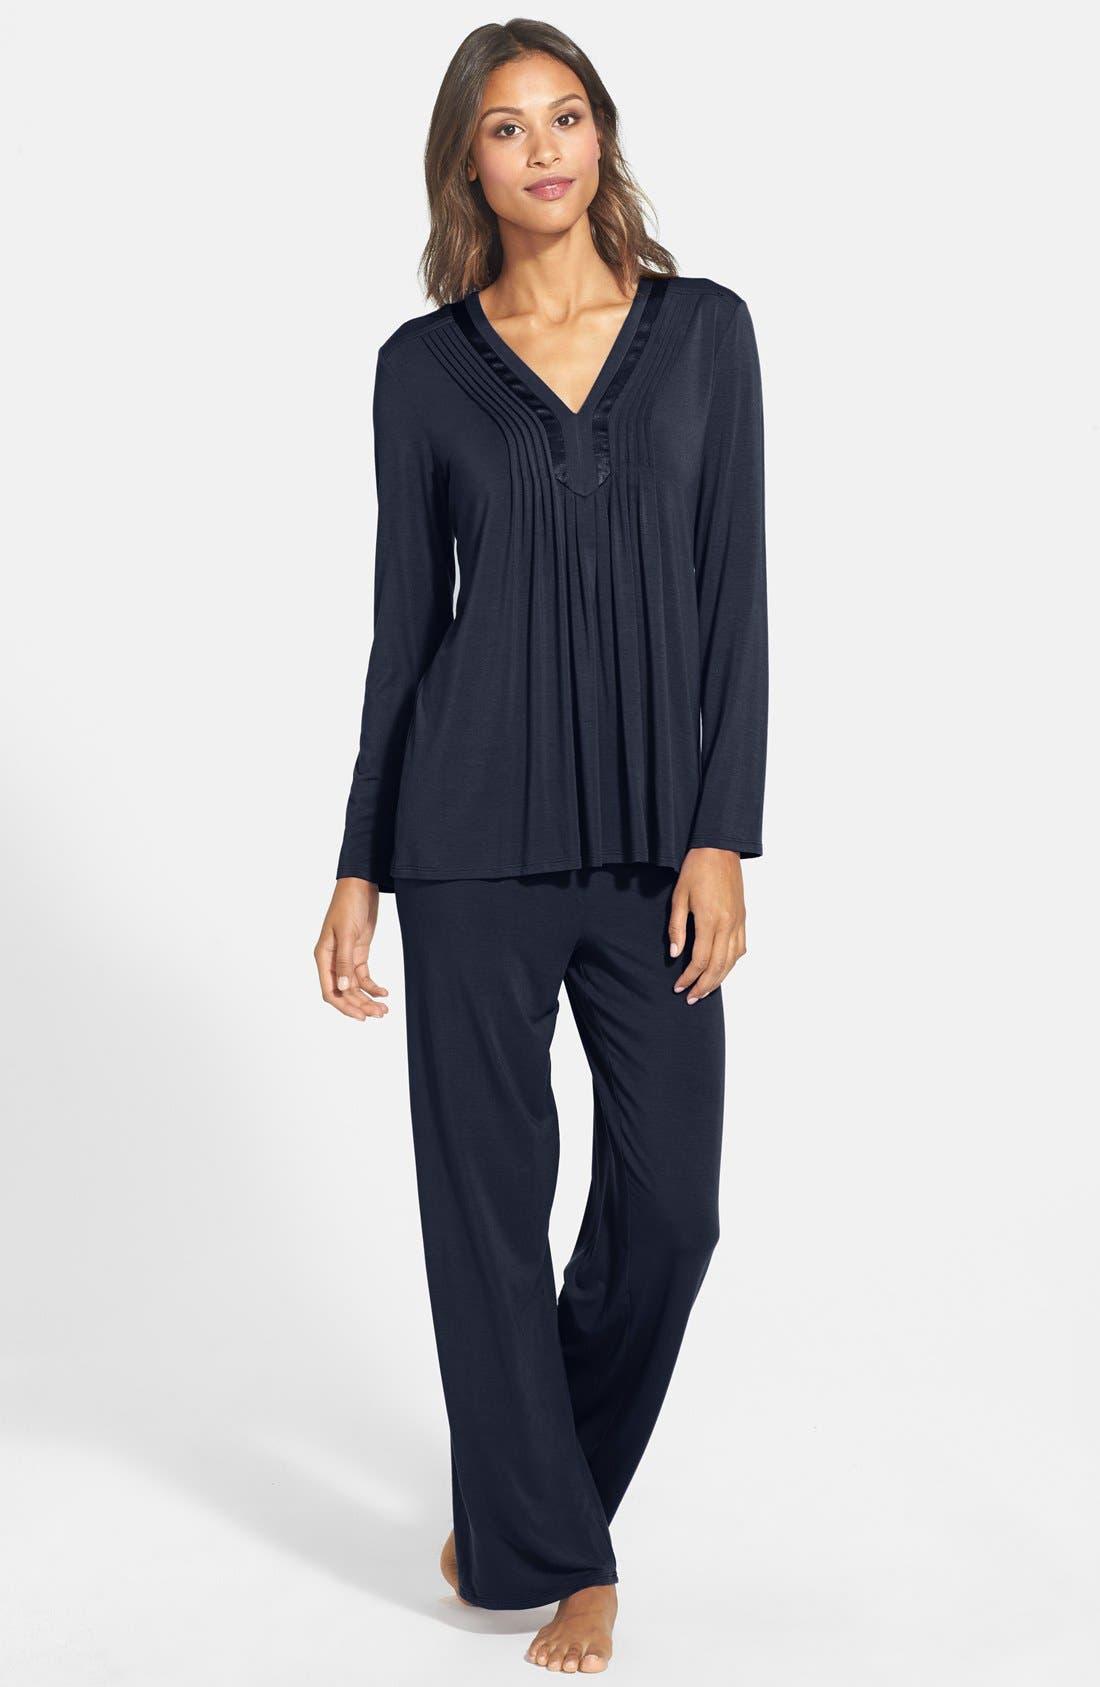 Main Image - Midnight by Carole Hochman 'Restful Mornings' Pajamas